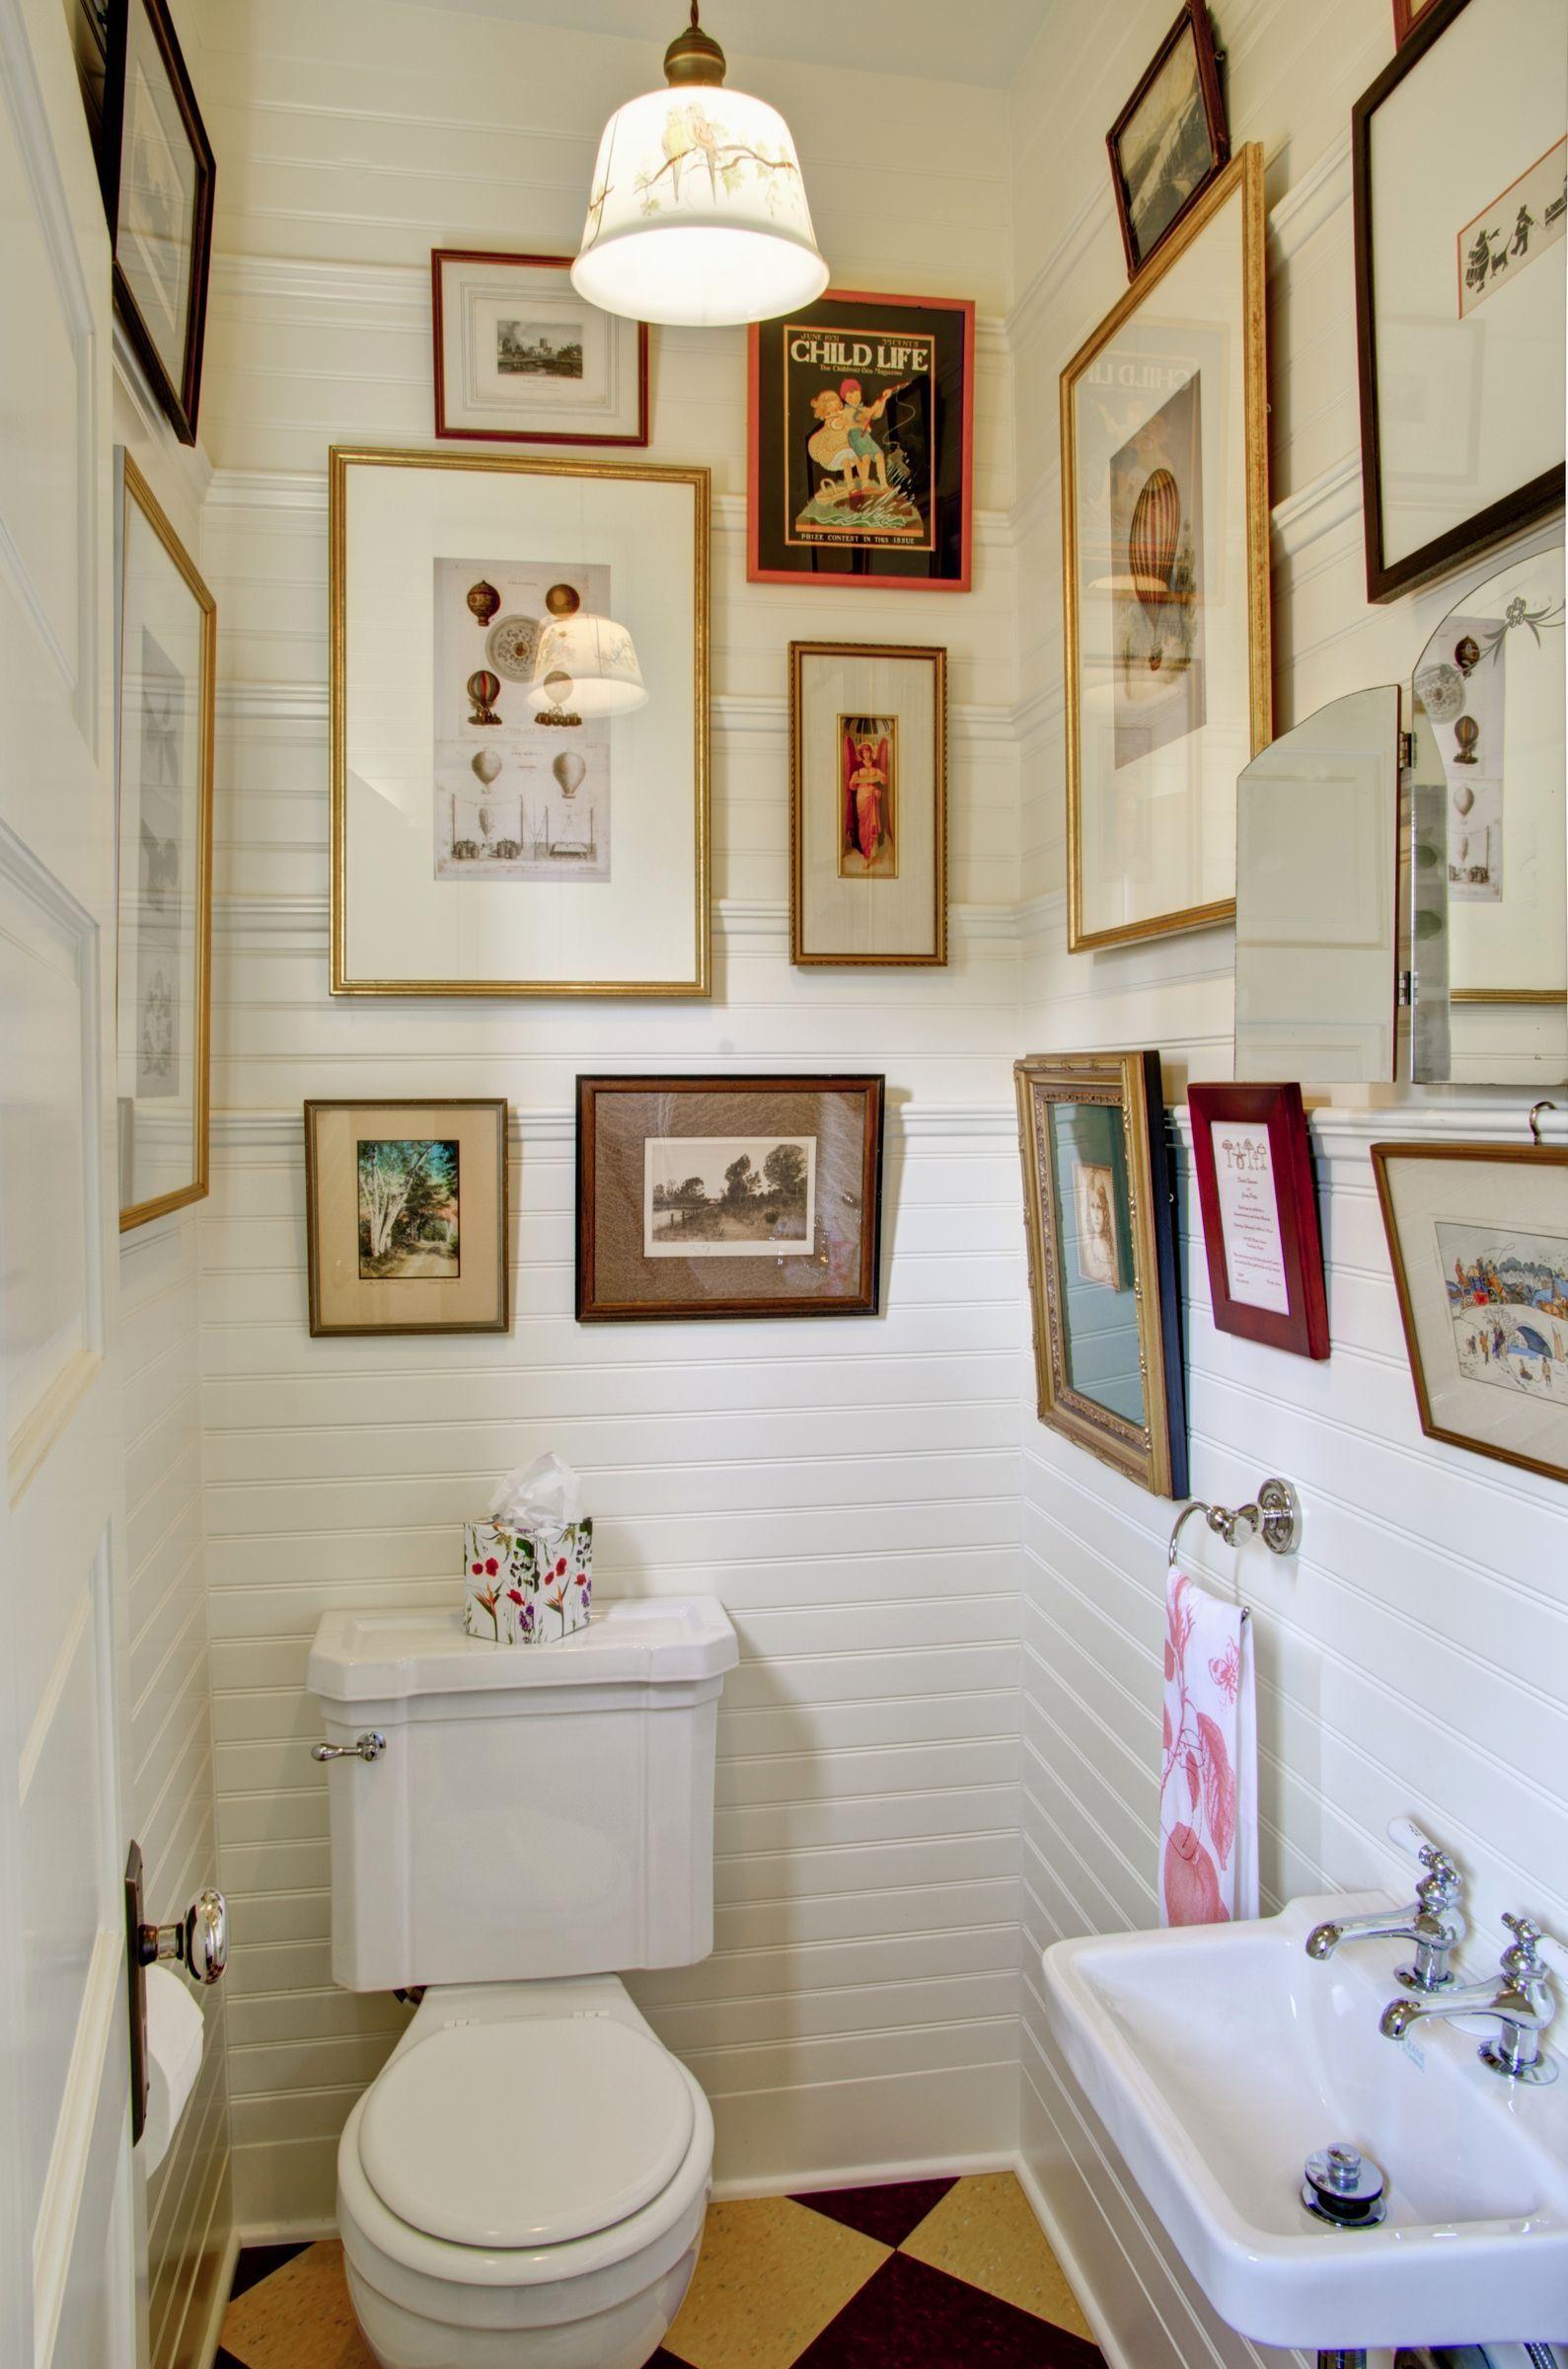 Lake House Bathroom Decor Inspirational Home Design Ideal Lak Wall